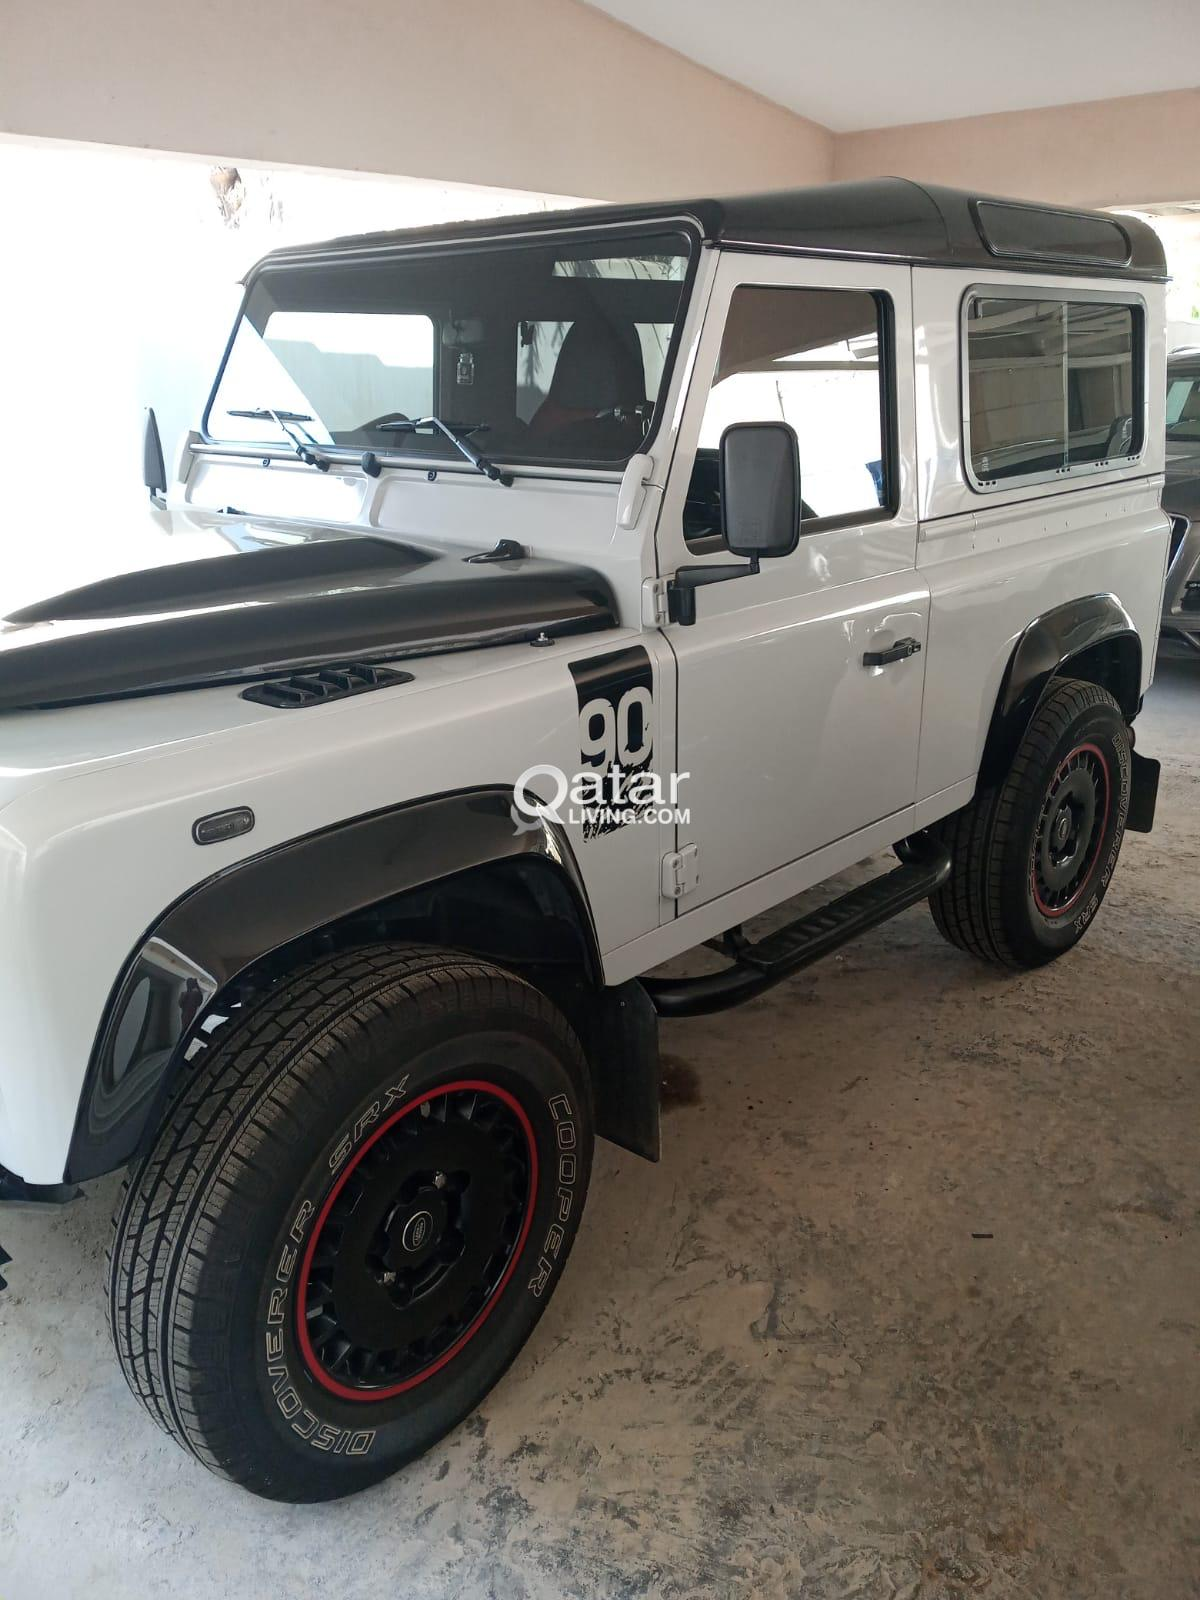 2016 Land Rover Defender (Kahn Design)